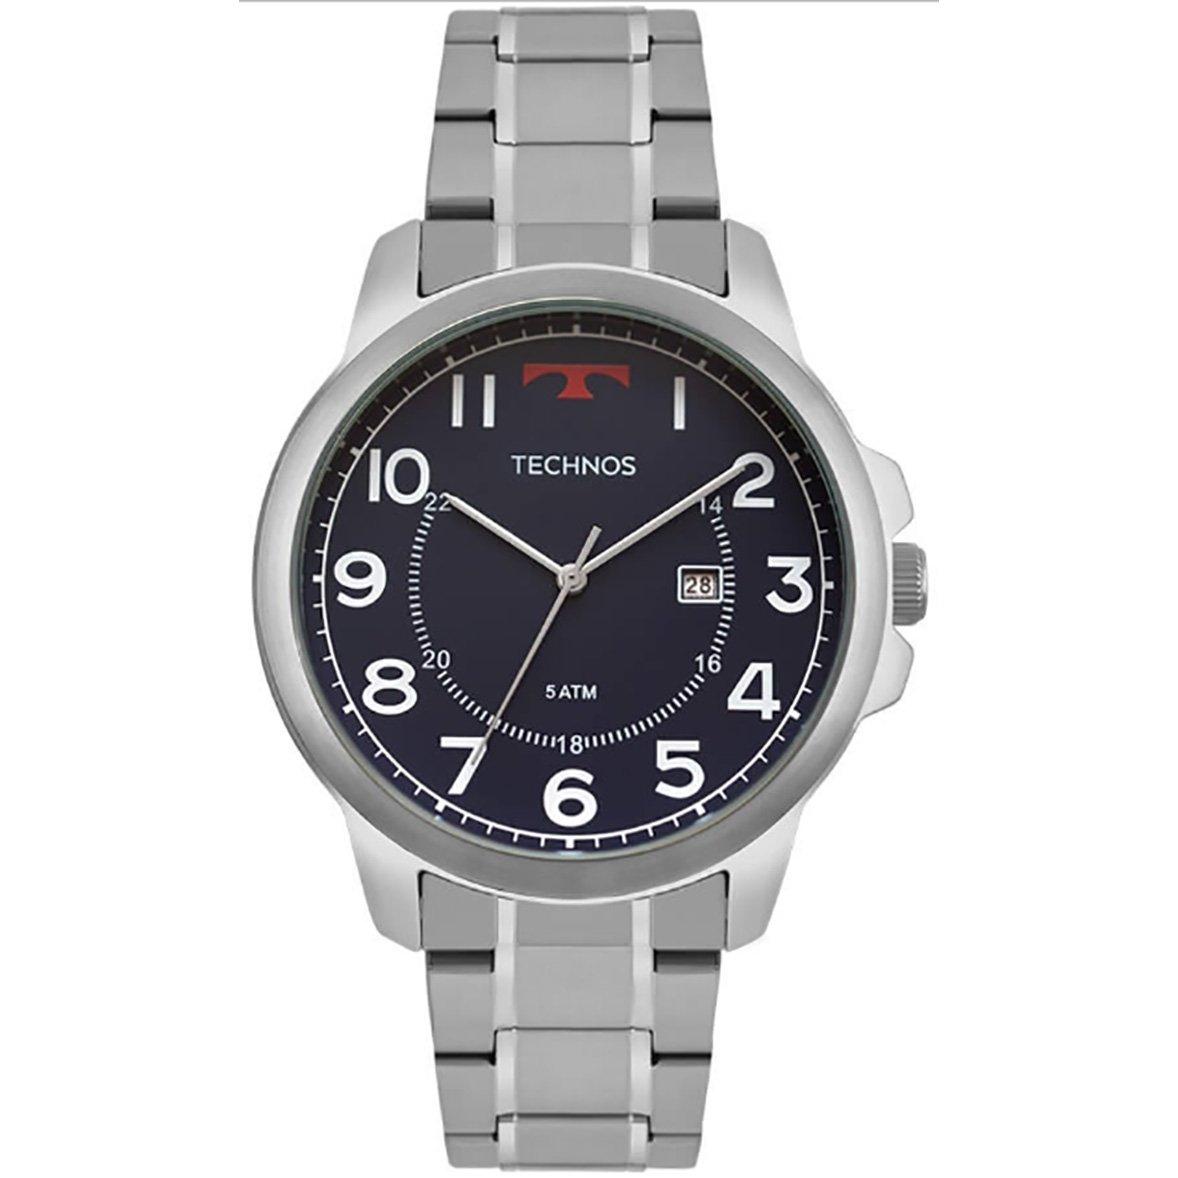 ed1b179cd0a Compre relógio technos em tri jóia shop jpg 1178x1178 Relogios technos black